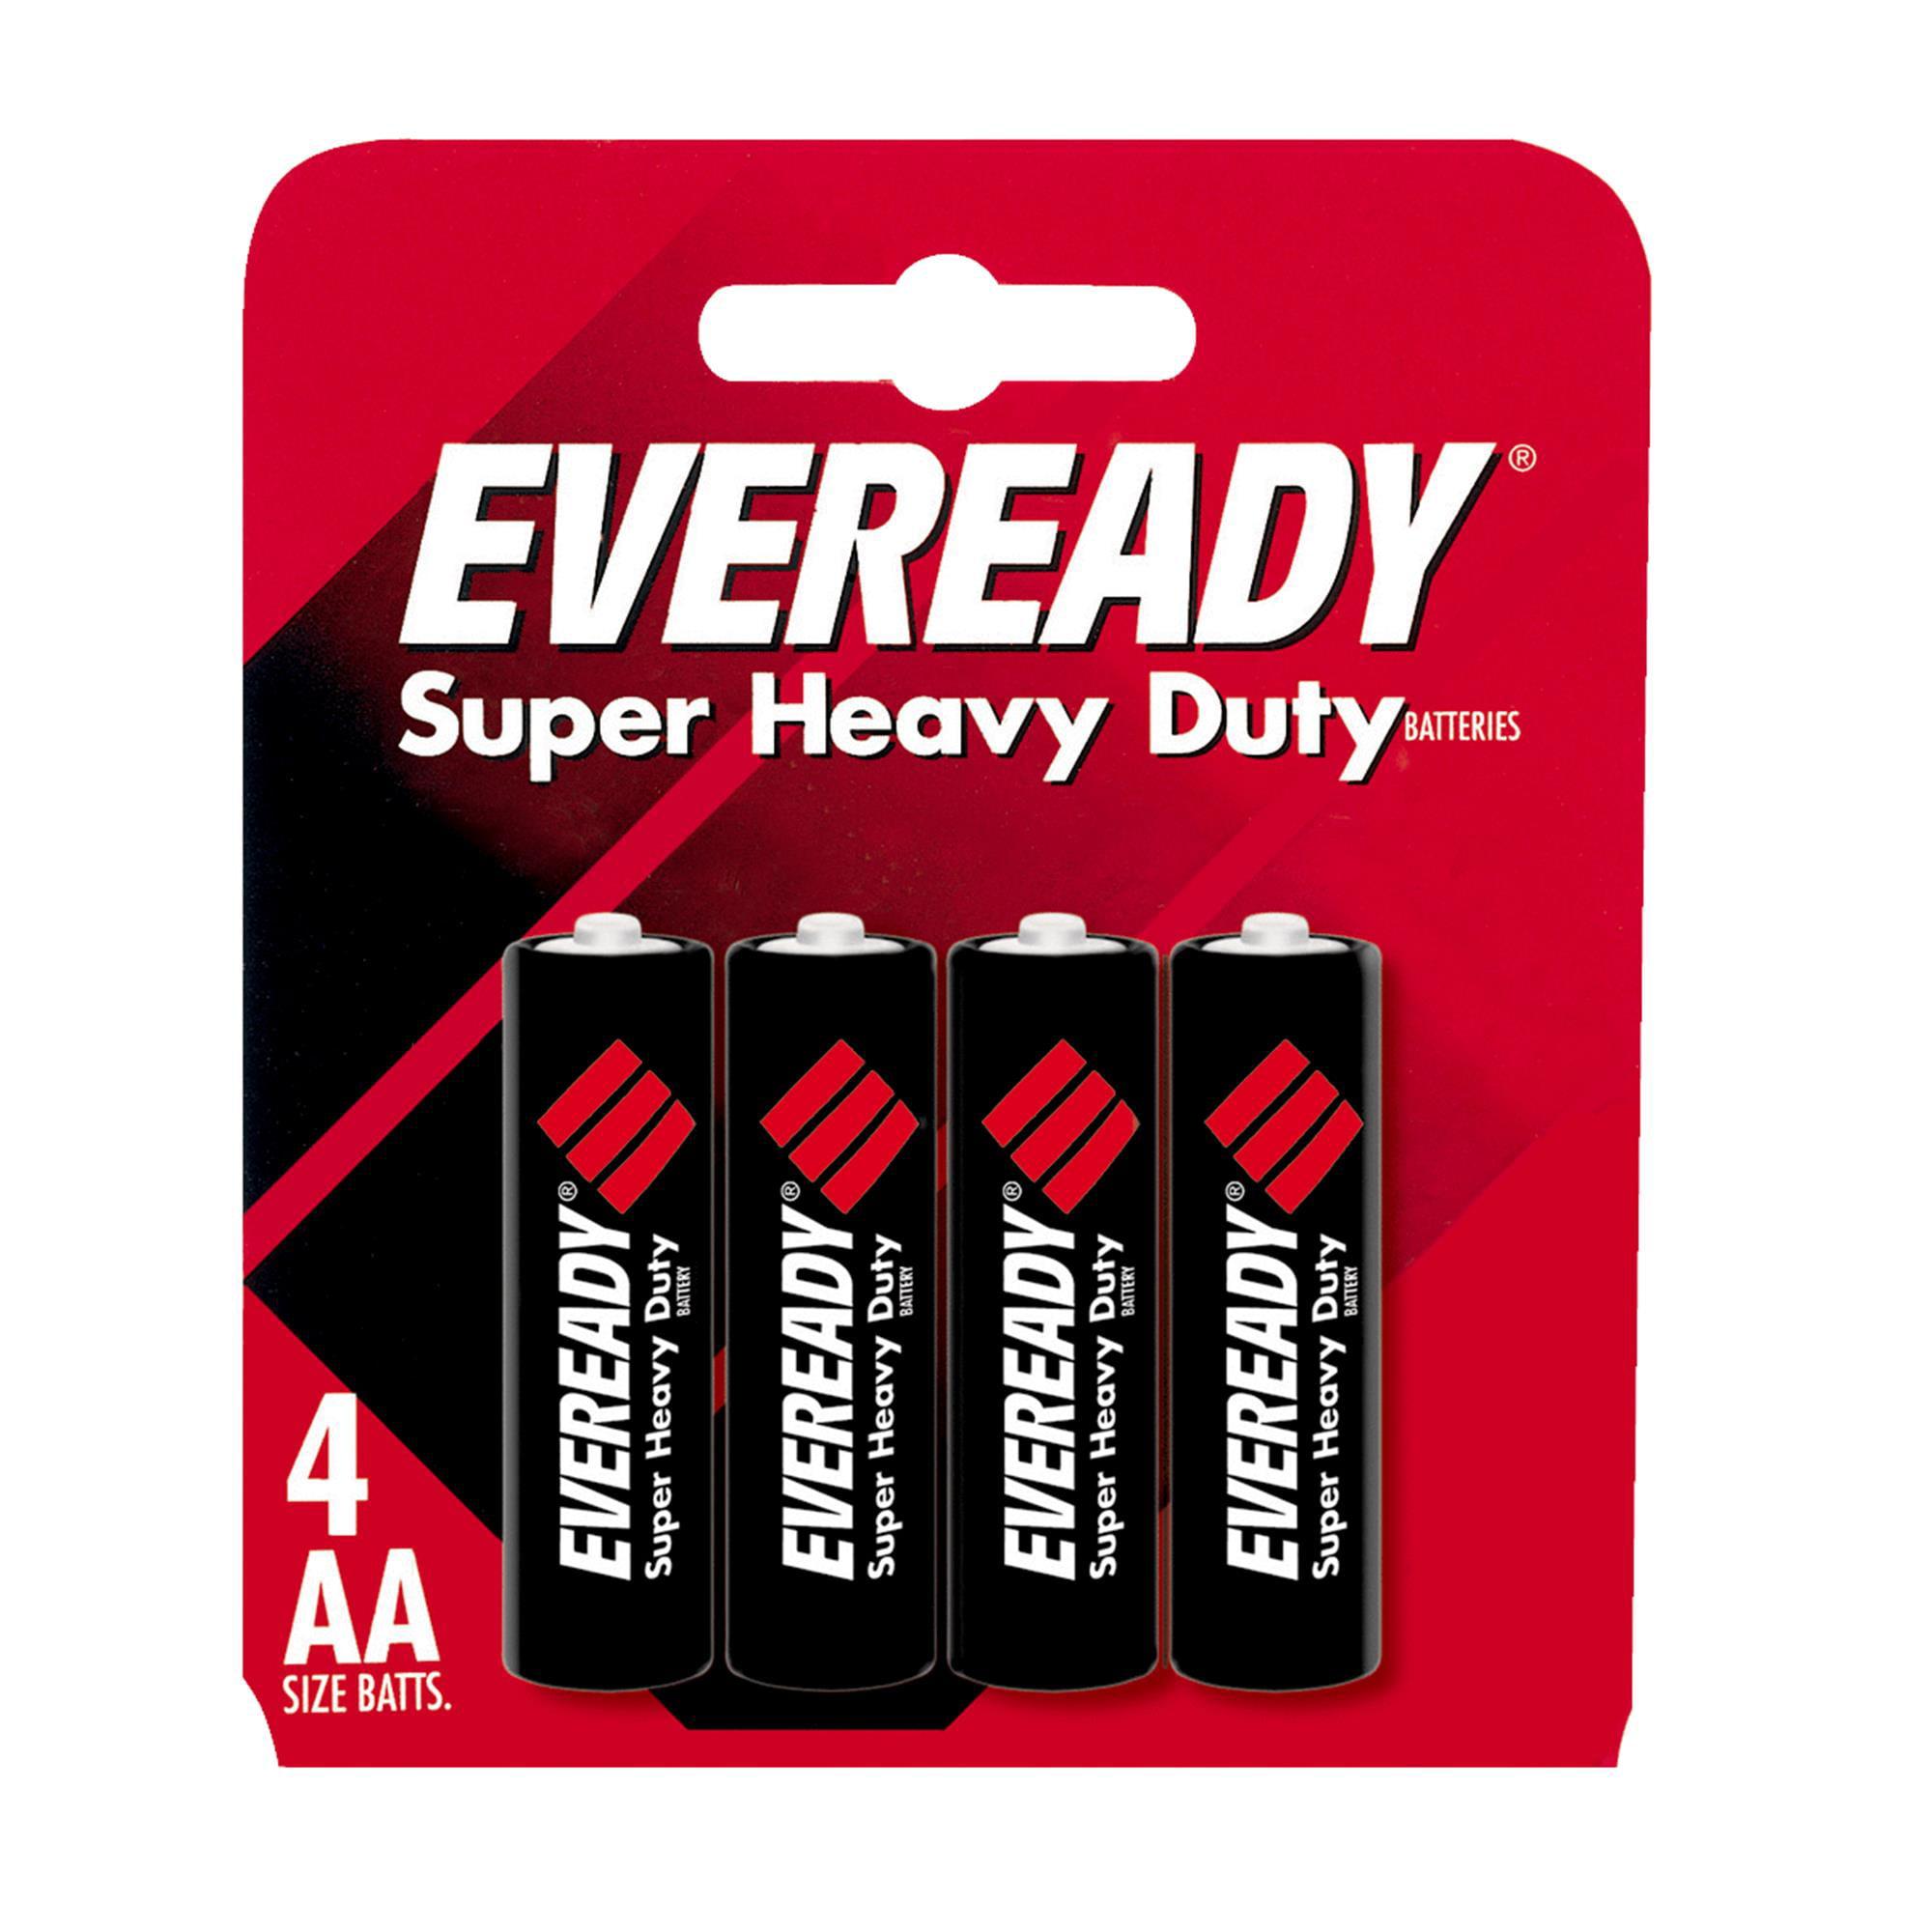 Eveready Super Heavy Duty AA Carbon Zinc Battery